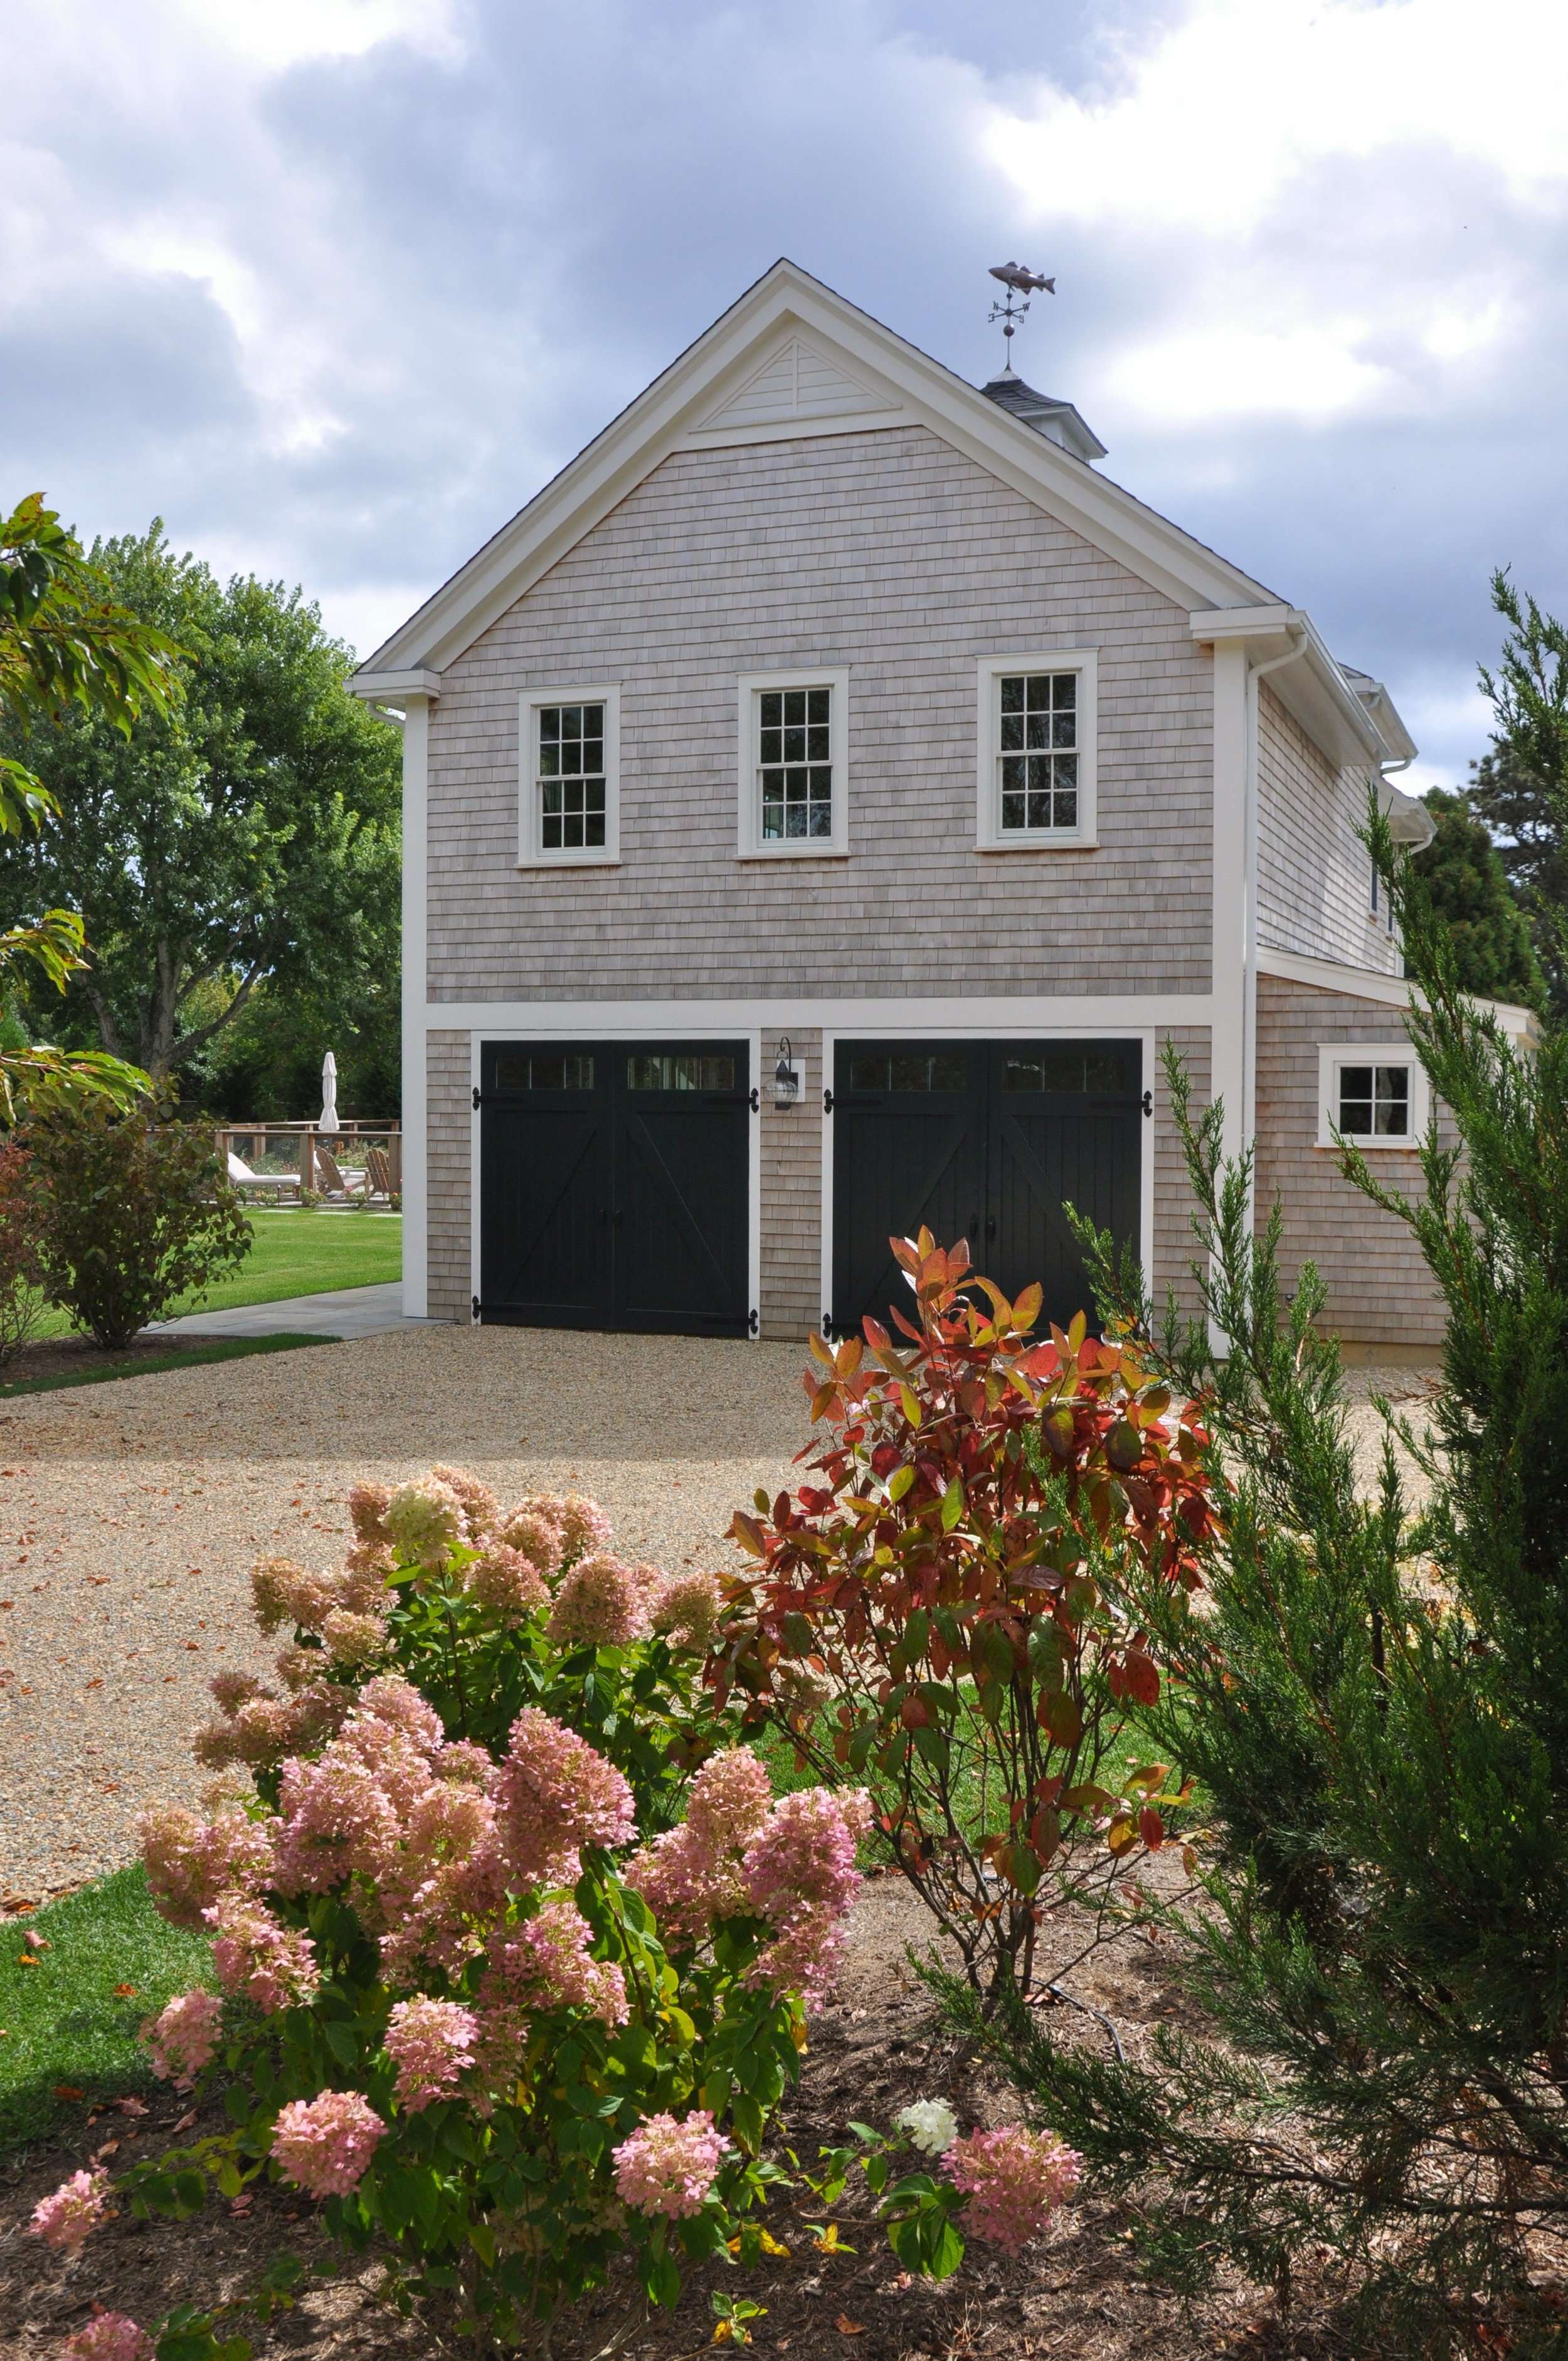 Modern_Farmhouse_Garage_Guesthouse.jpg